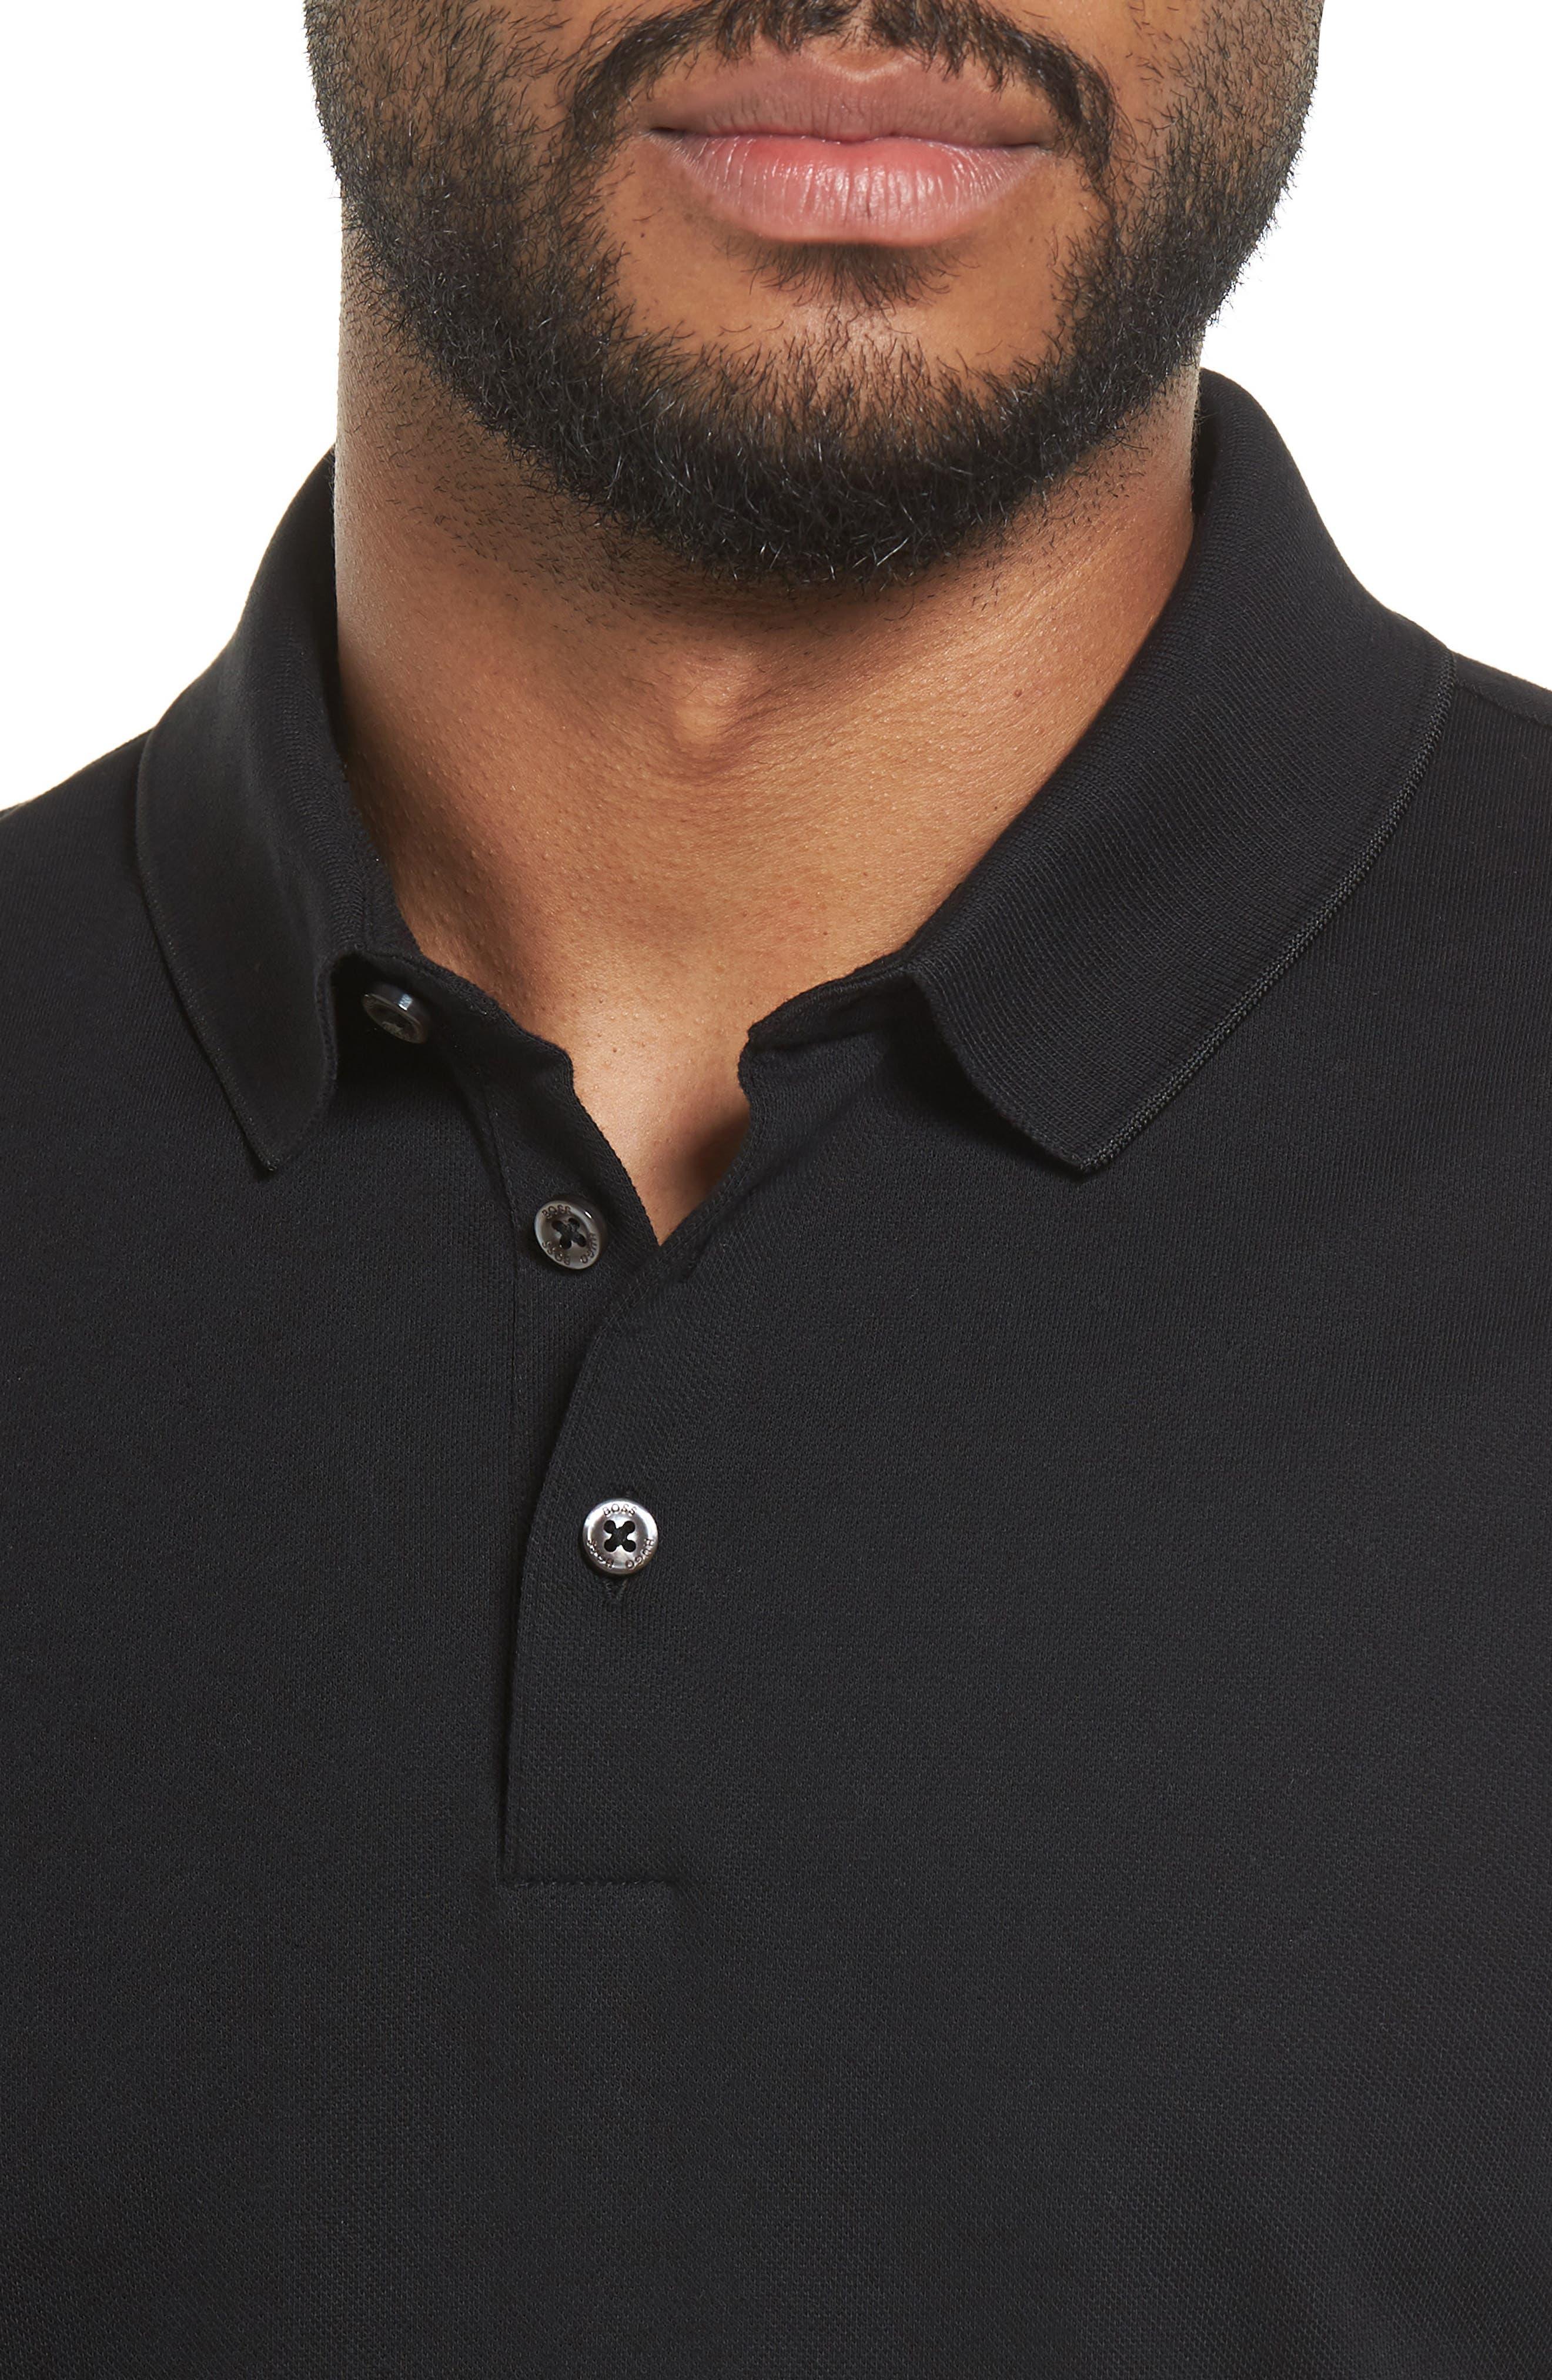 Pleins Slim Fit Long Sleeve Polo,                             Alternate thumbnail 4, color,                             001